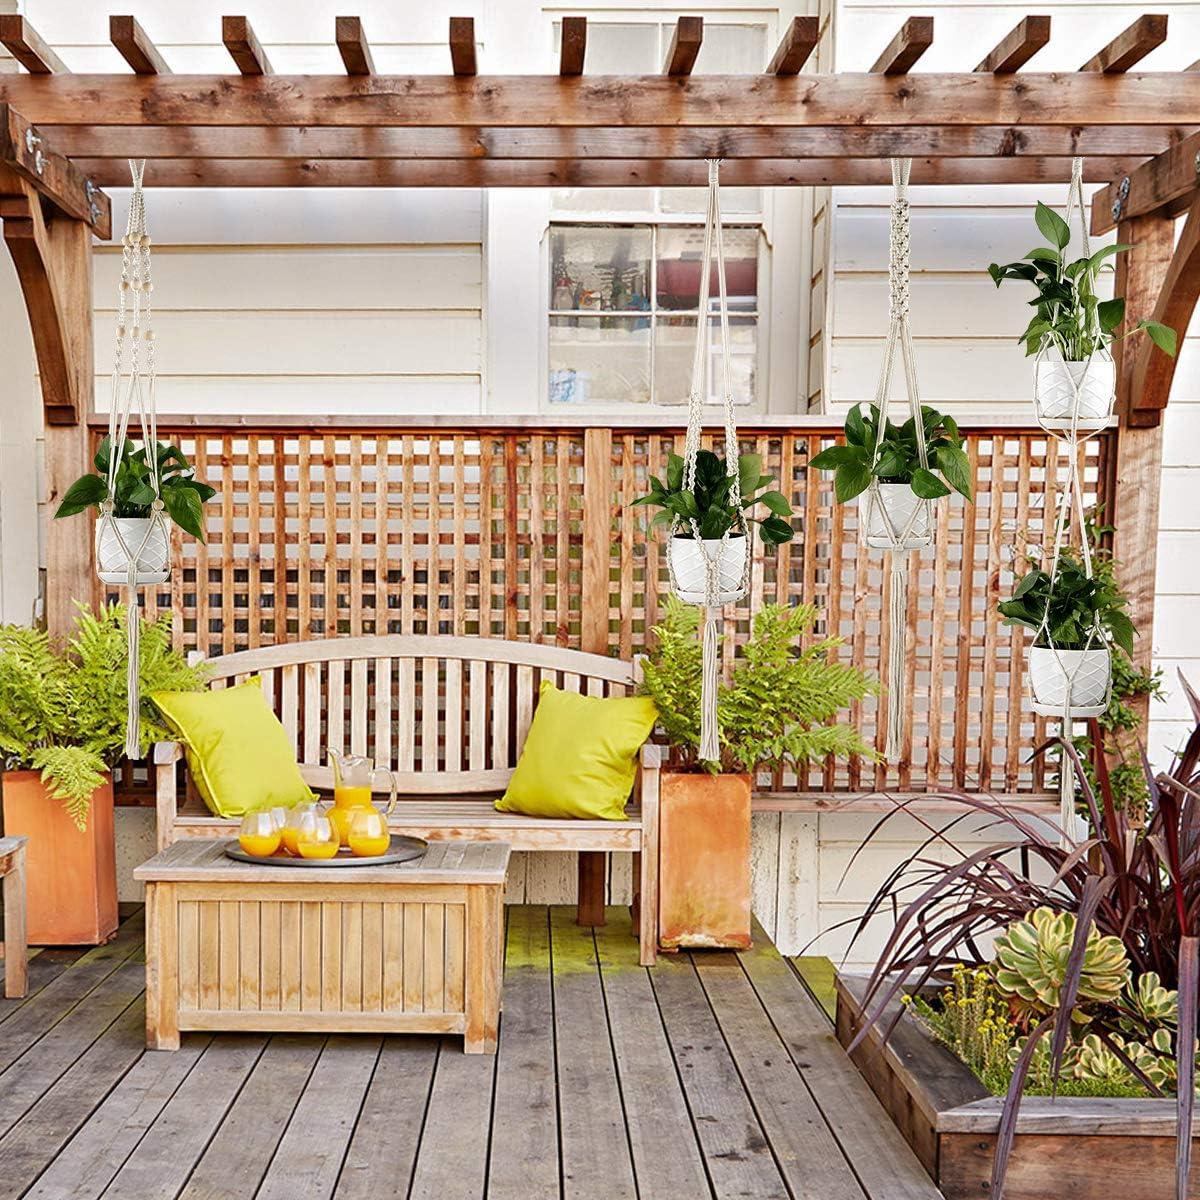 Balkon- Decken- Philorn 4er Set Baumwollseil H/ängeampel Blumentopf Ampeln Makramee Blumenampel f/ür Innen- 47//39 Wanddekoration Pflanzen Halter Aufh/änger Au/ßen-